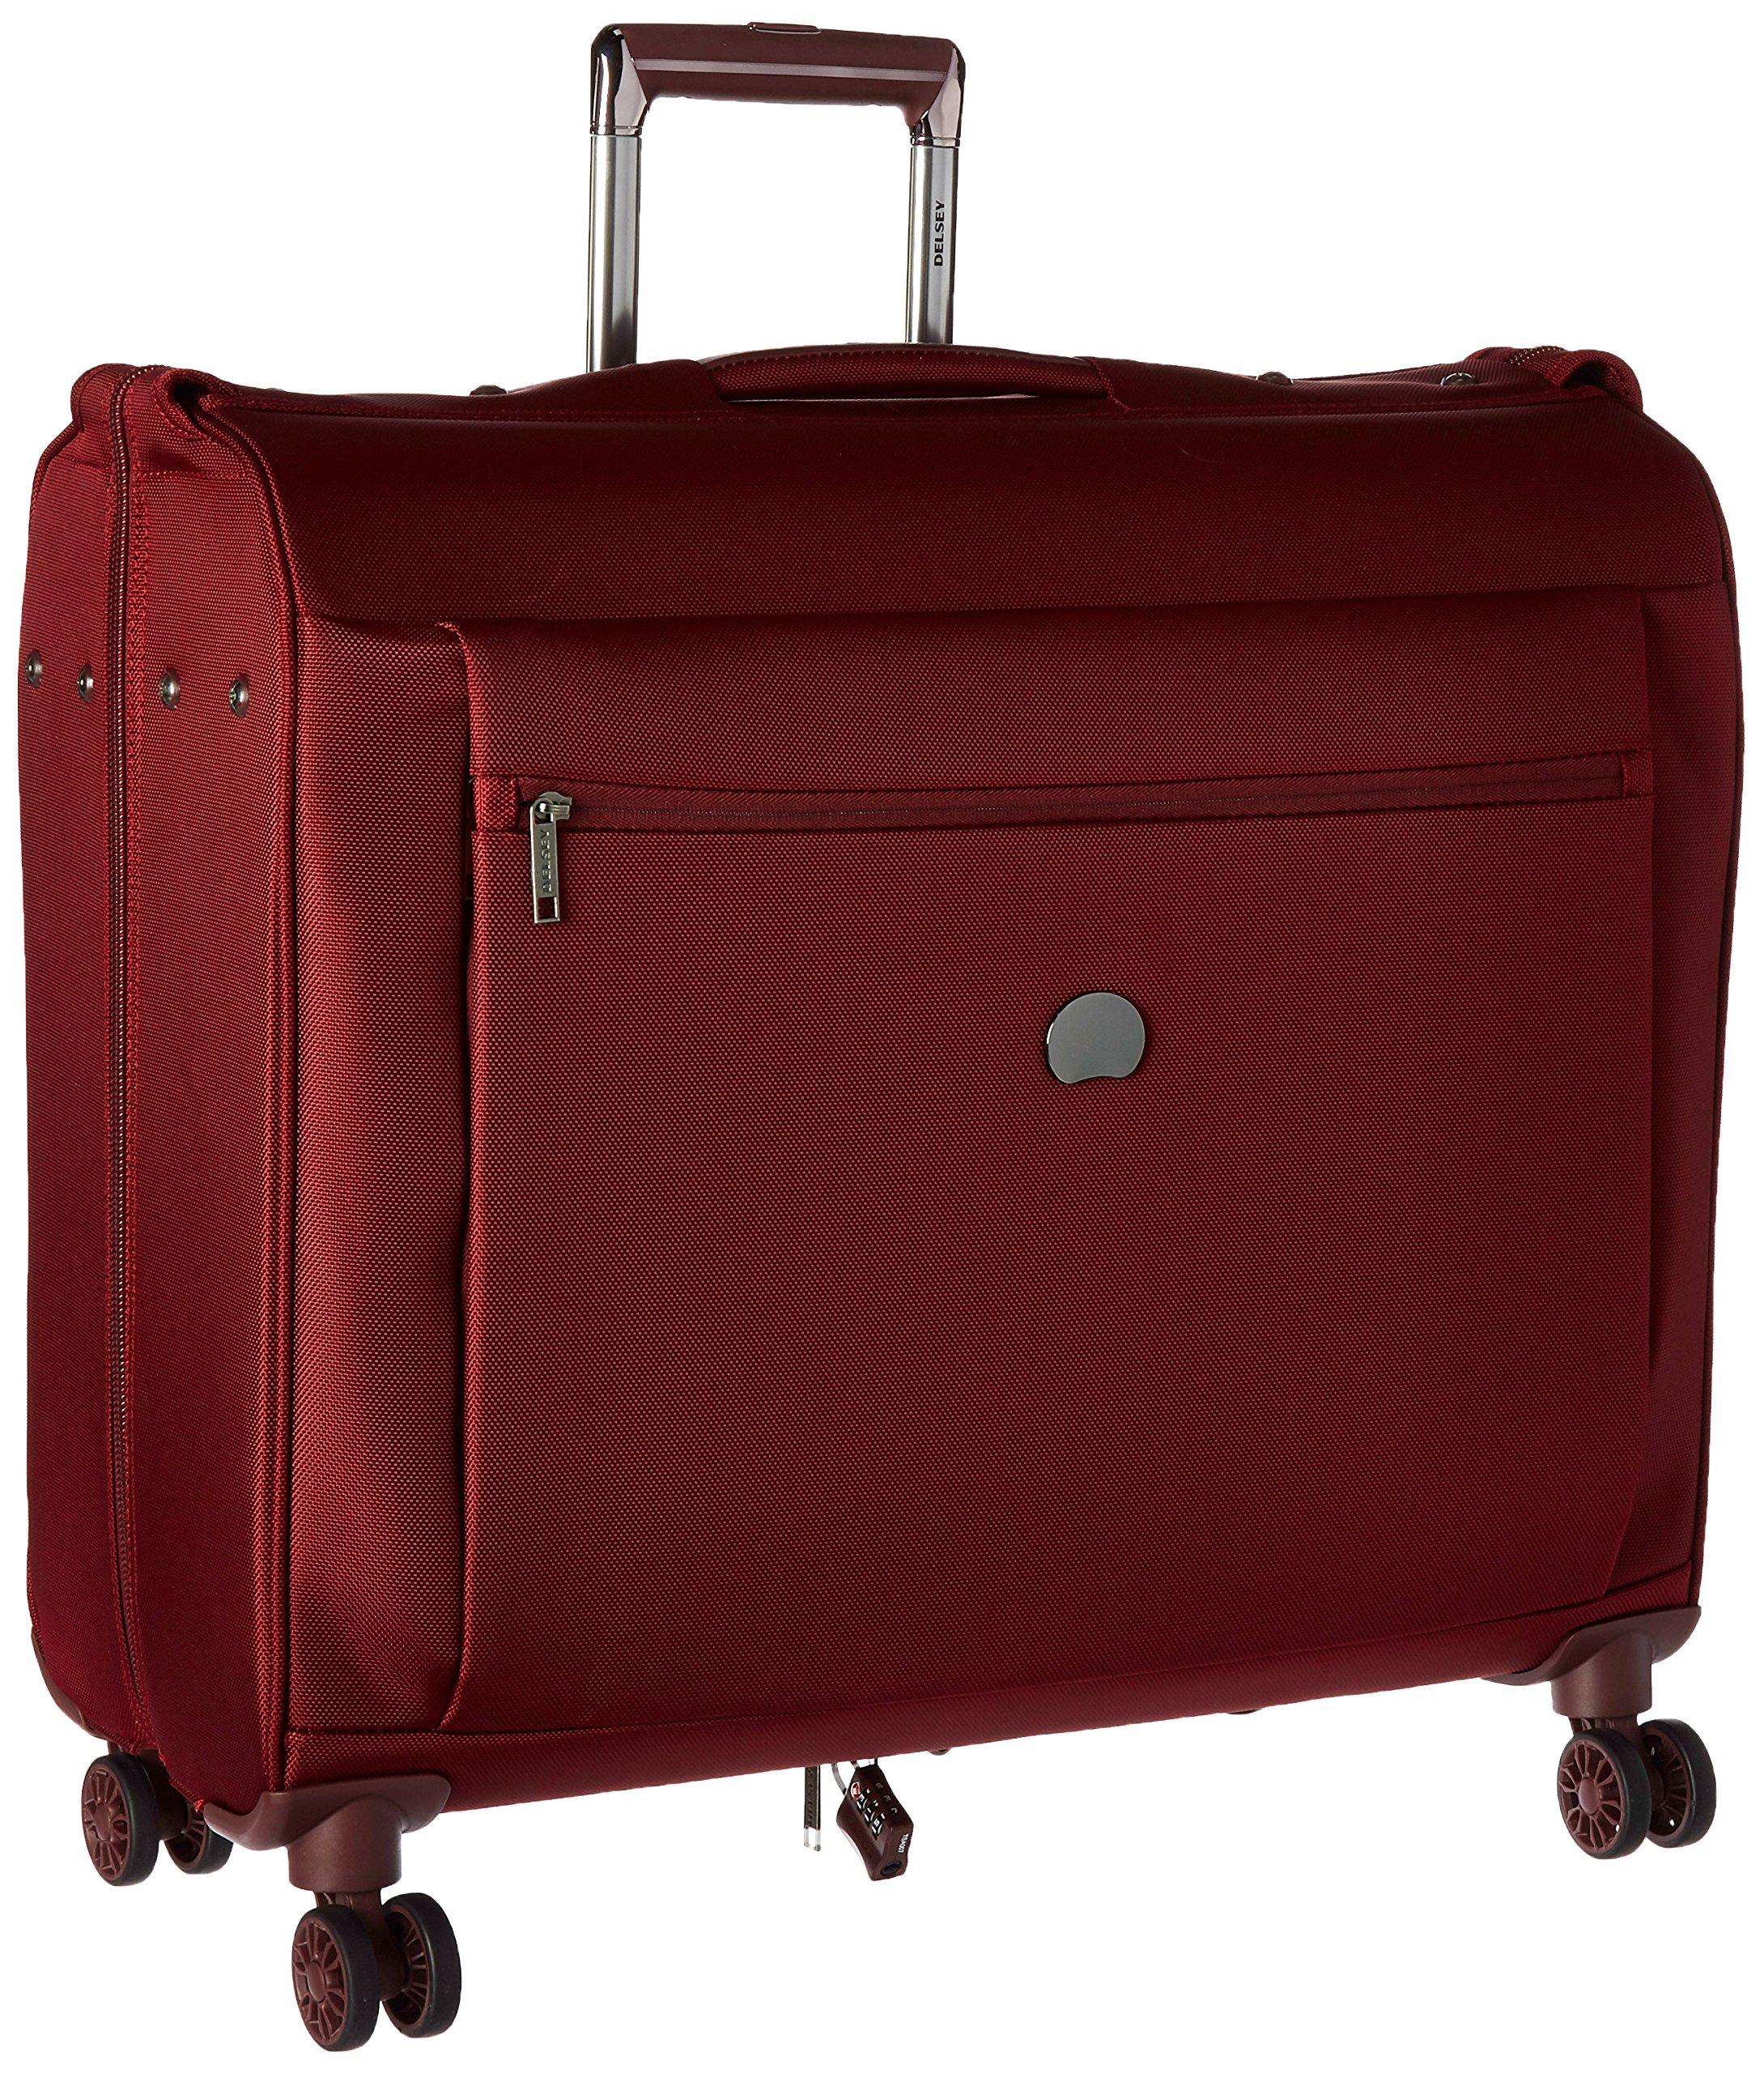 Delsey Luggage Montmartre+ 4 Wheel Spinner Garment Bag, Bordeaux Red